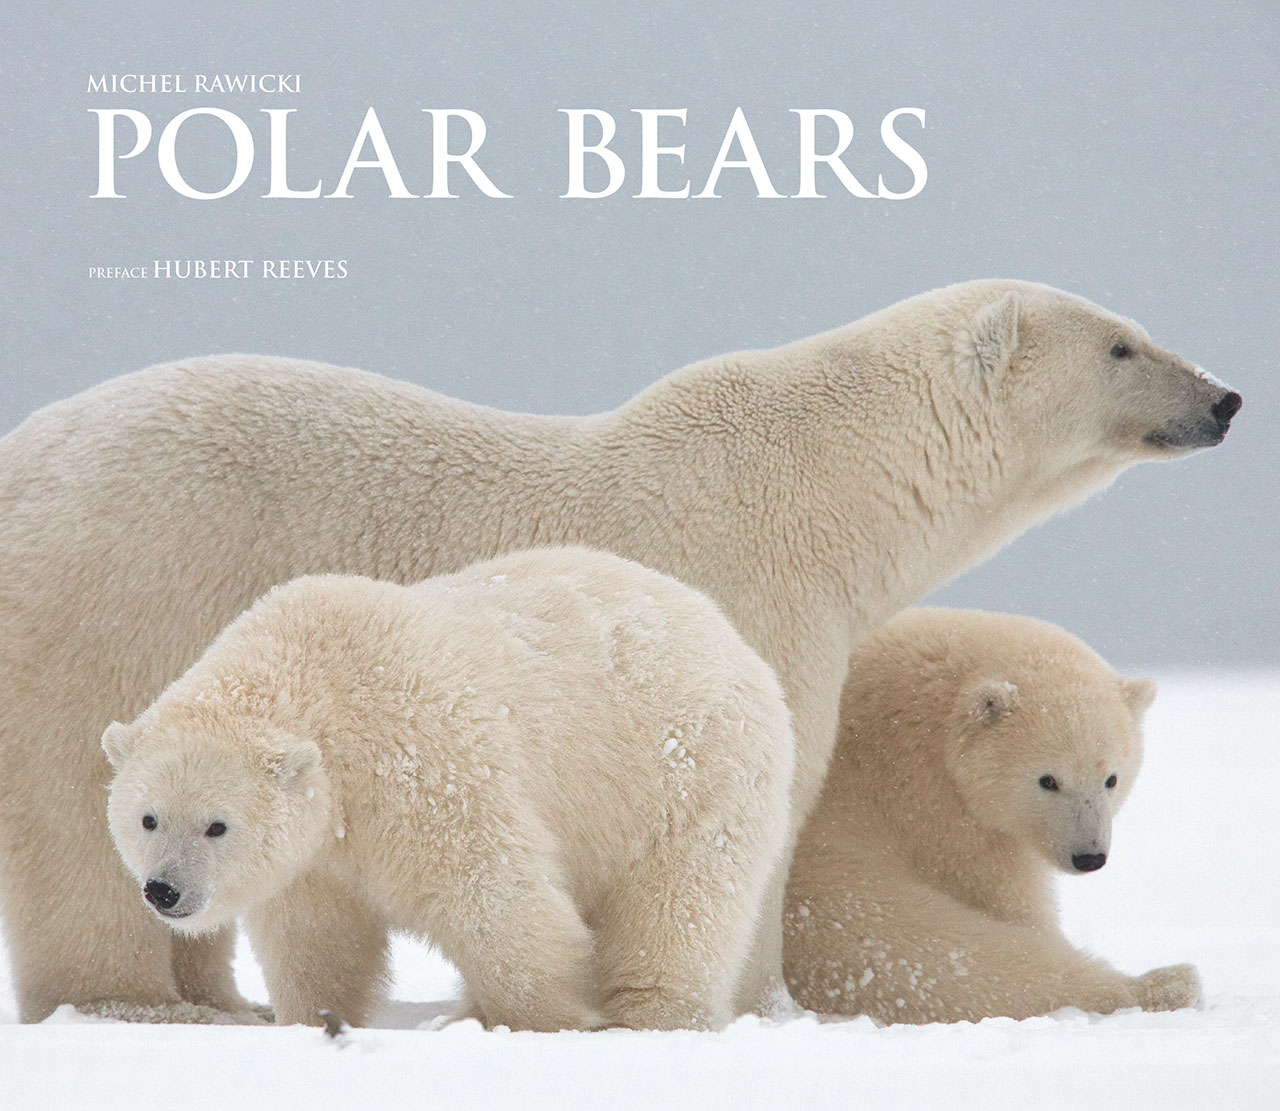 Michel Rawicki -Polar Bears, Book Cover.Kaktovik, Barter Island, Alaska, USA.Photo by Michel Rawicki © ACC Arts Books Ltd © Albin Michel.